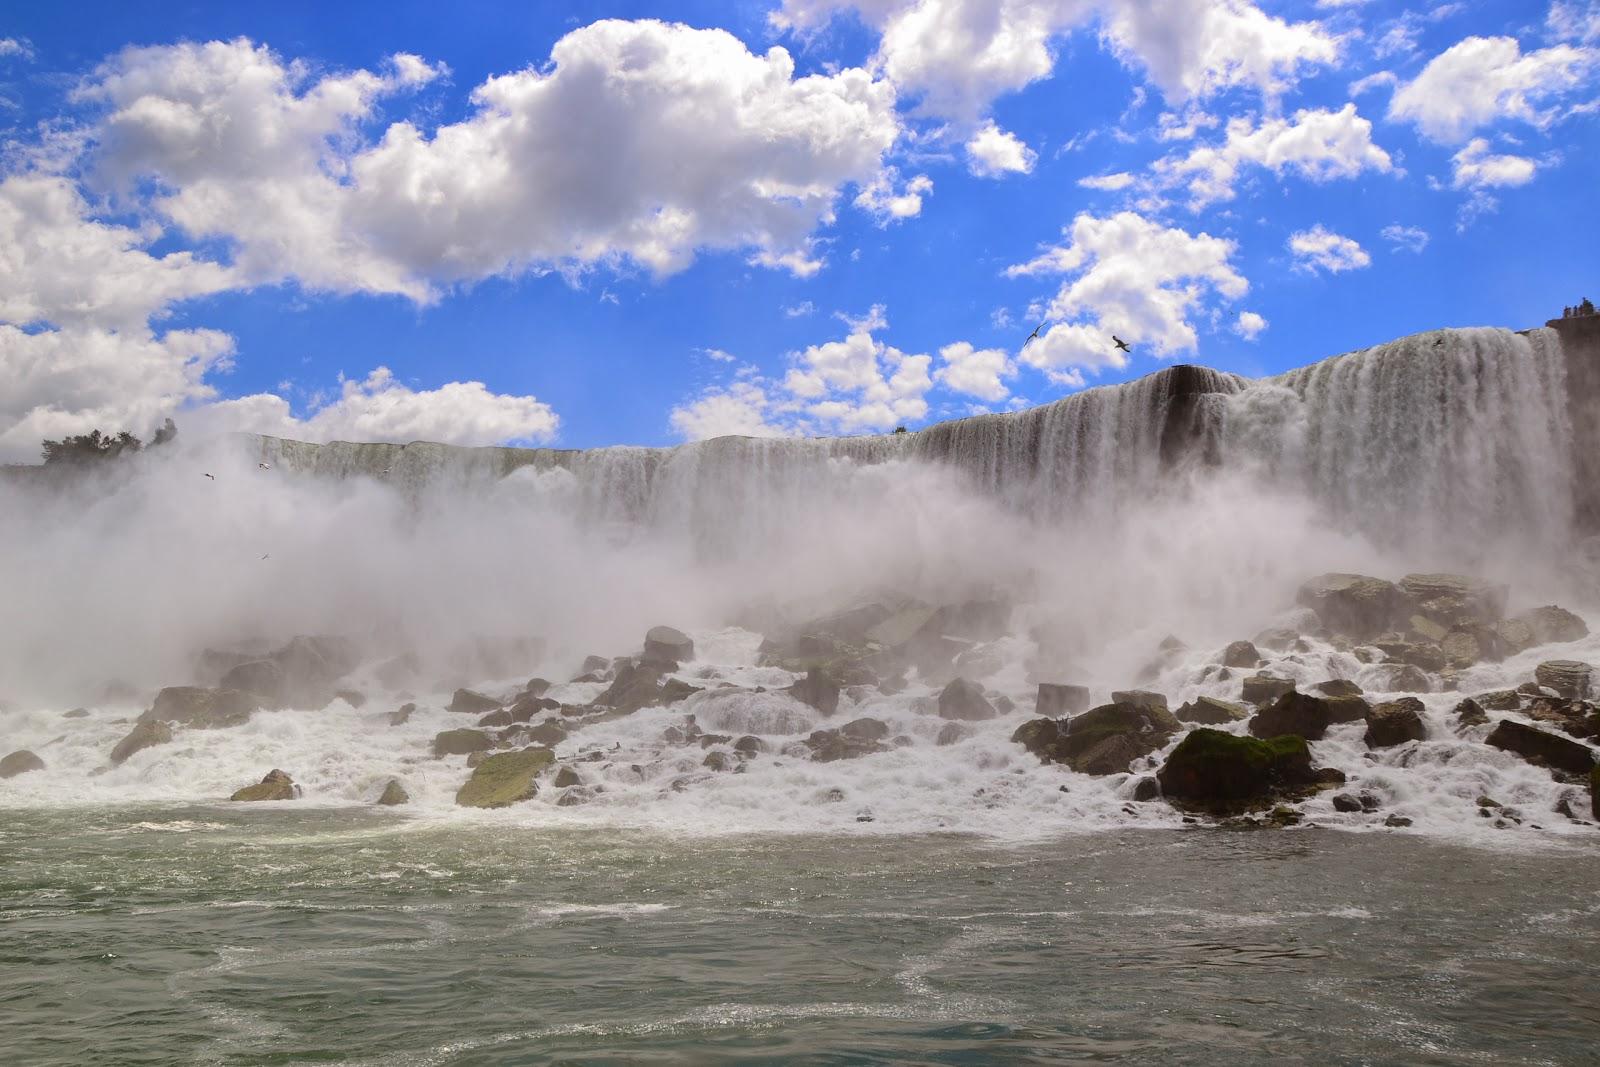 Spunci 39 s travels niagara falls canada on the road - Zoomarine bagno coi delfini ...